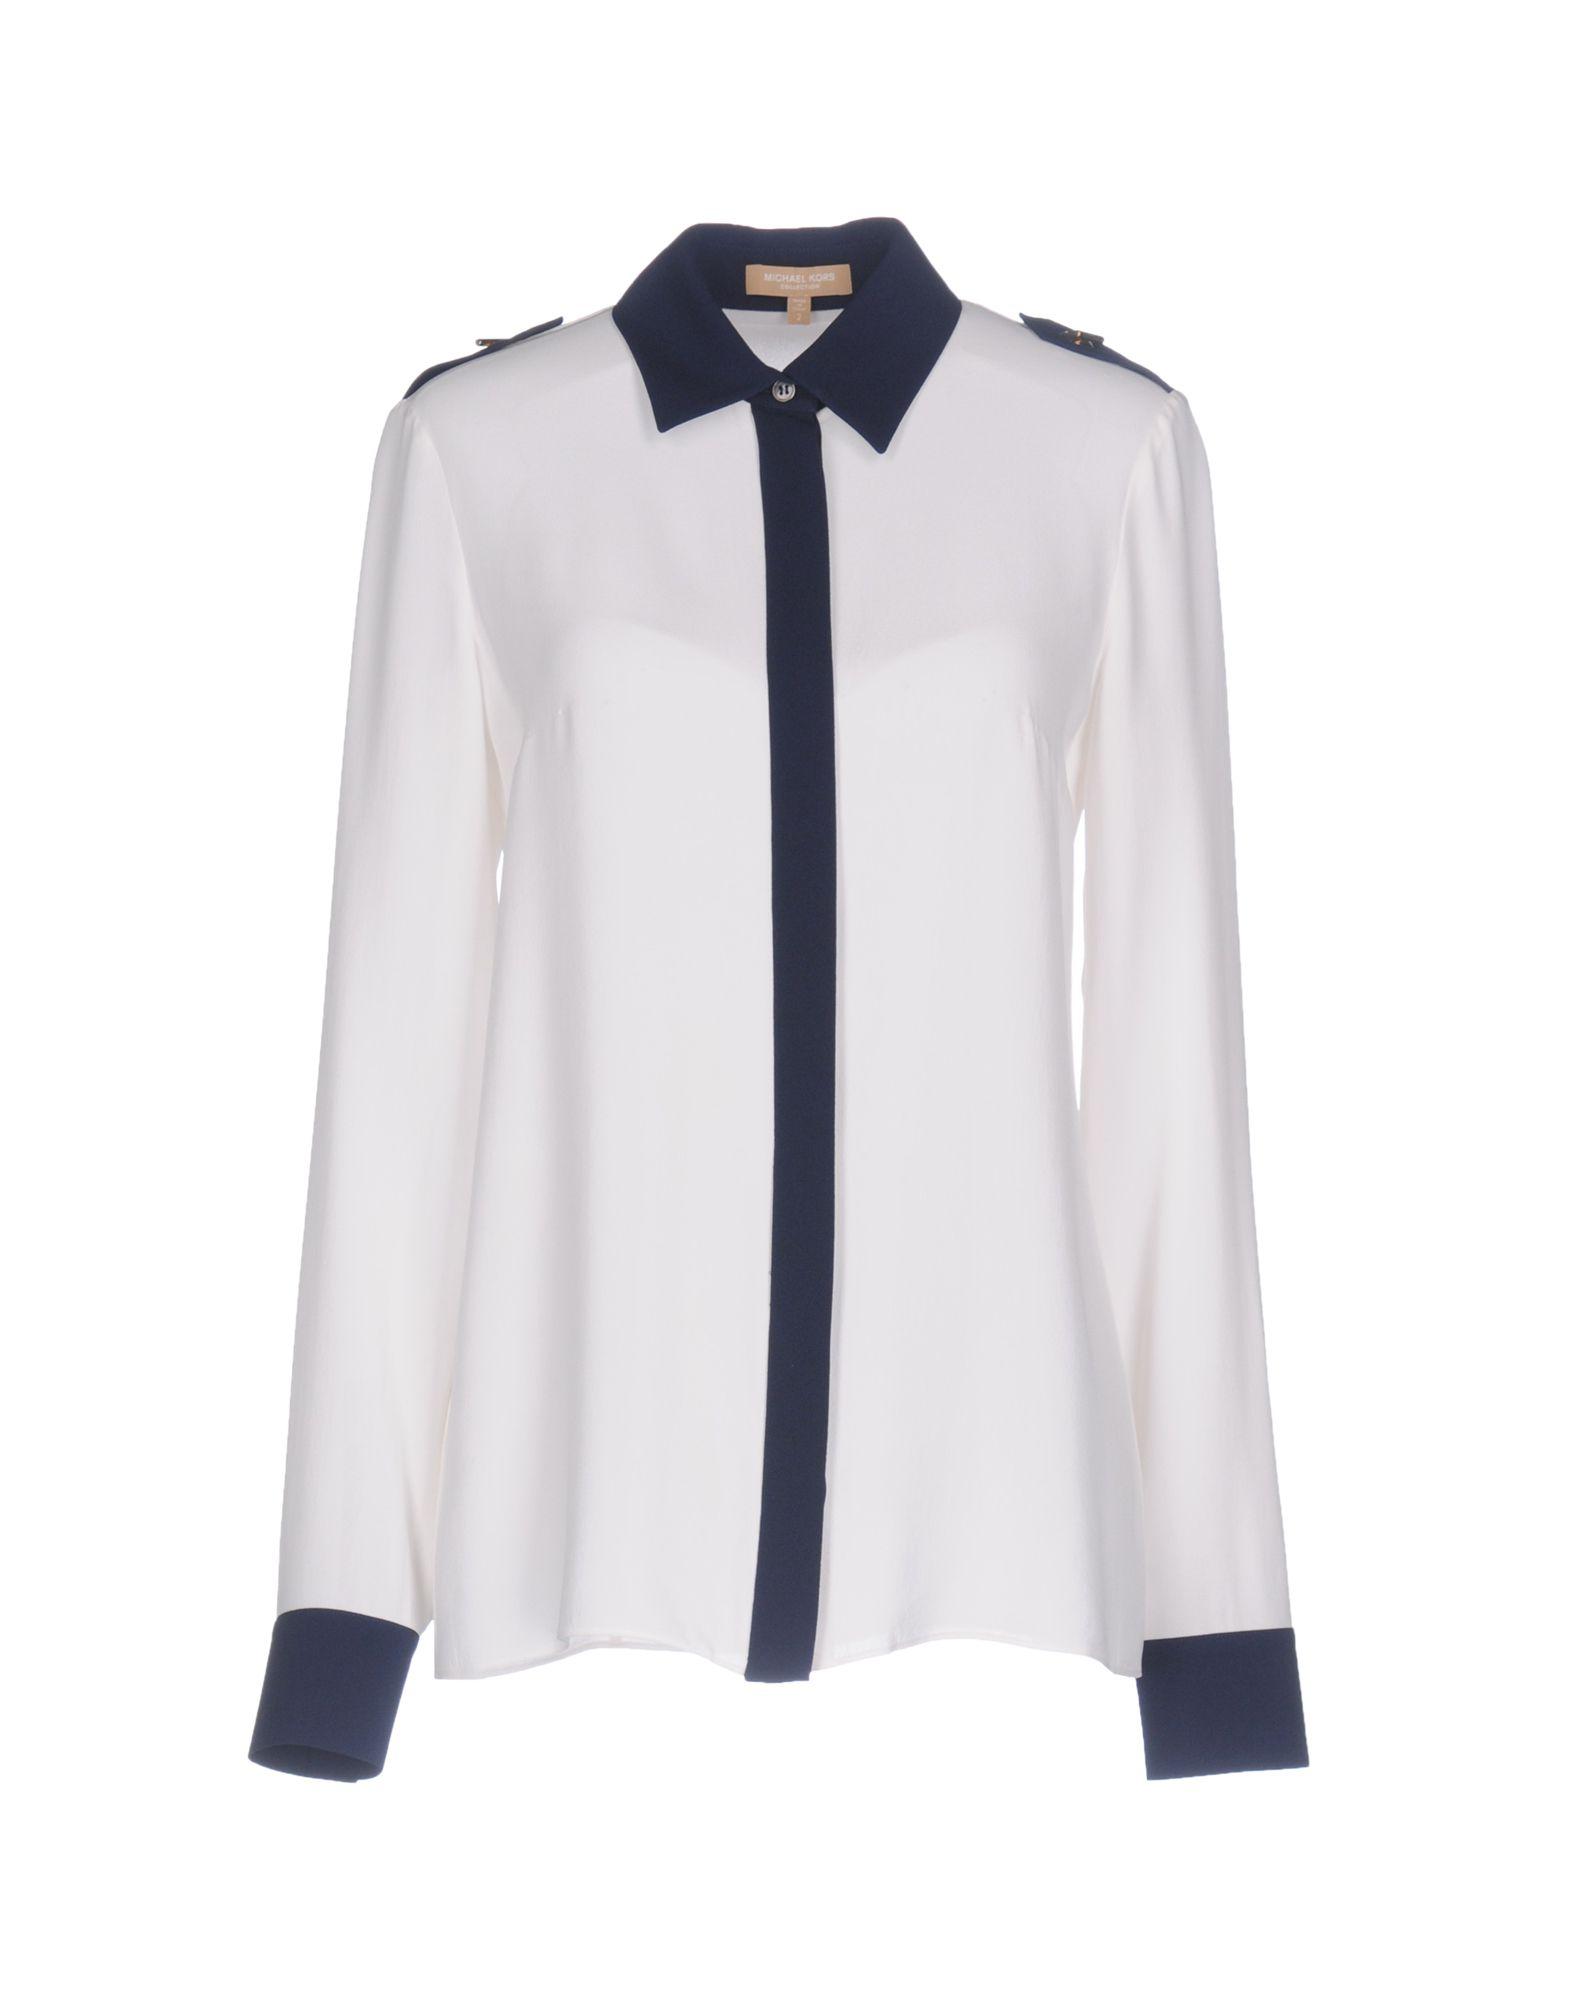 MICHAEL KORS COLLECTION Pубашка